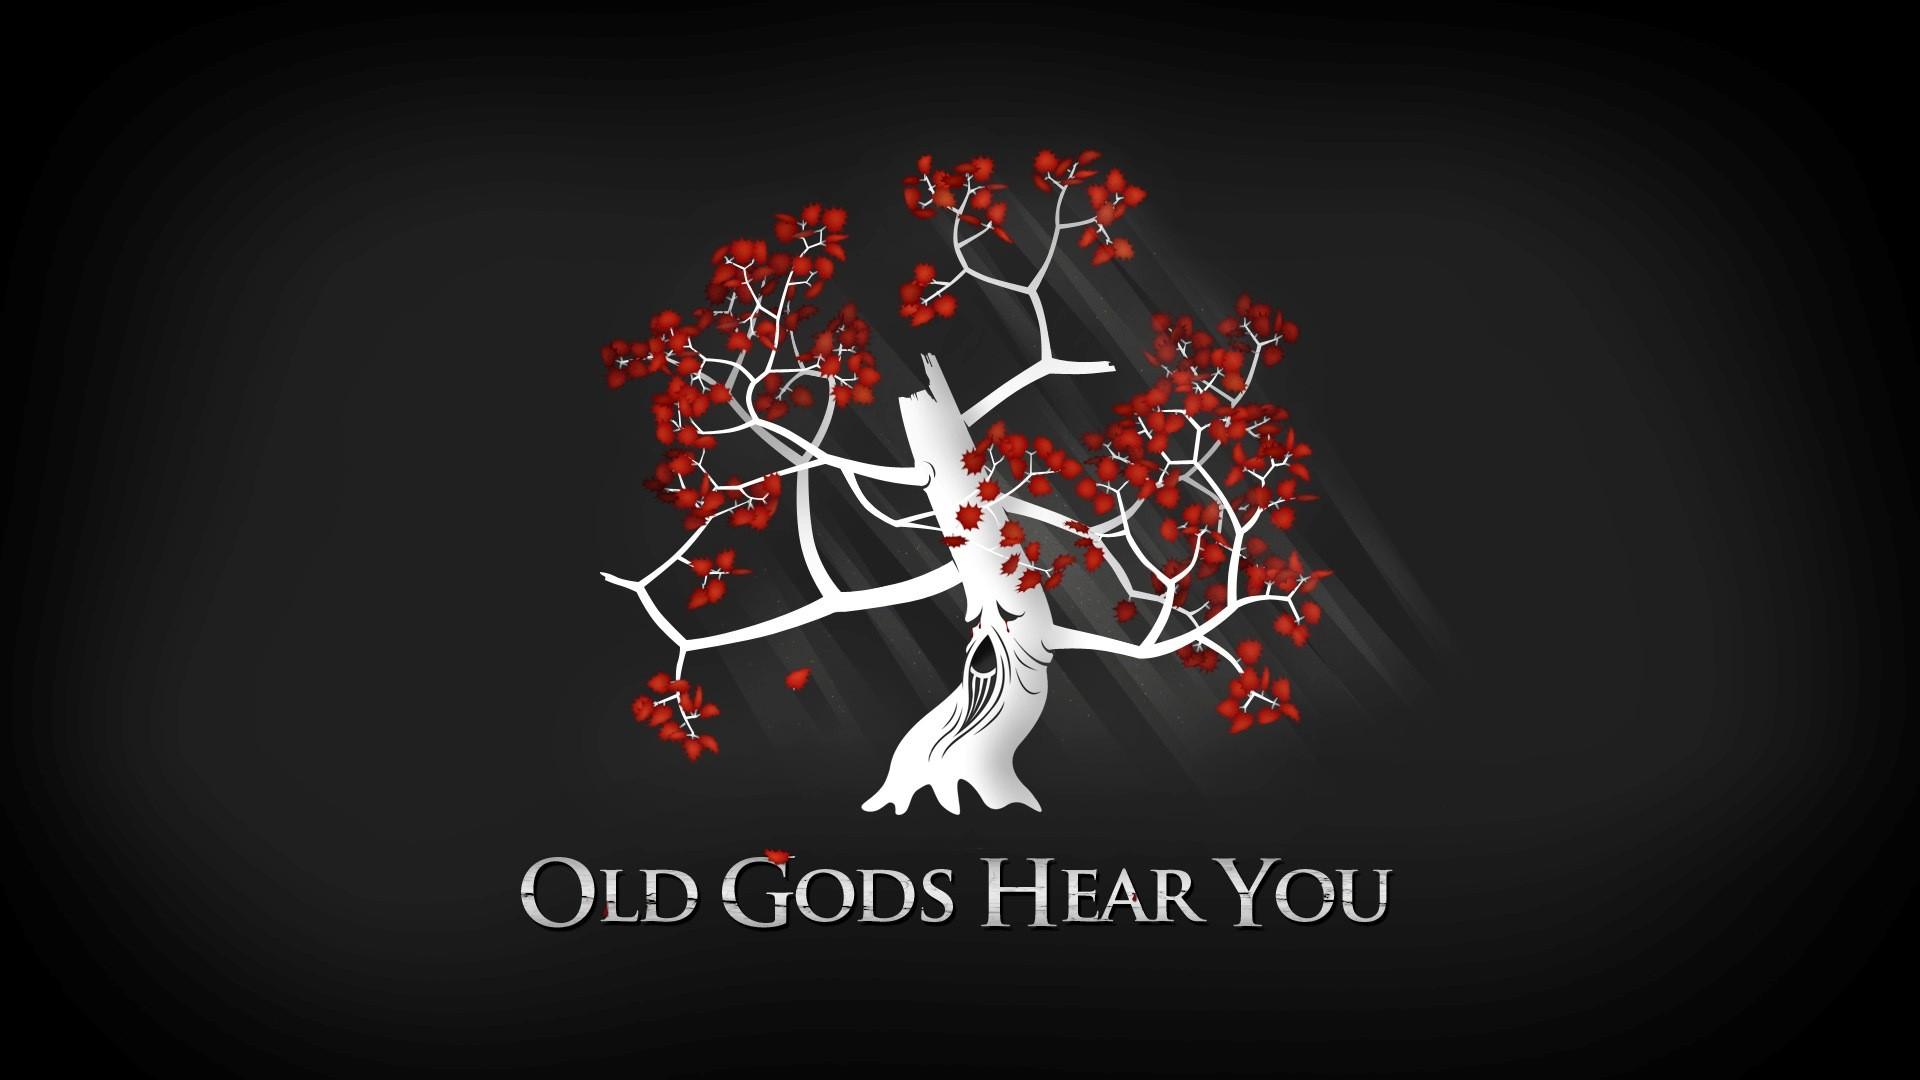 Game of Thrones Old Gods Hear You Desktop Wallpaper